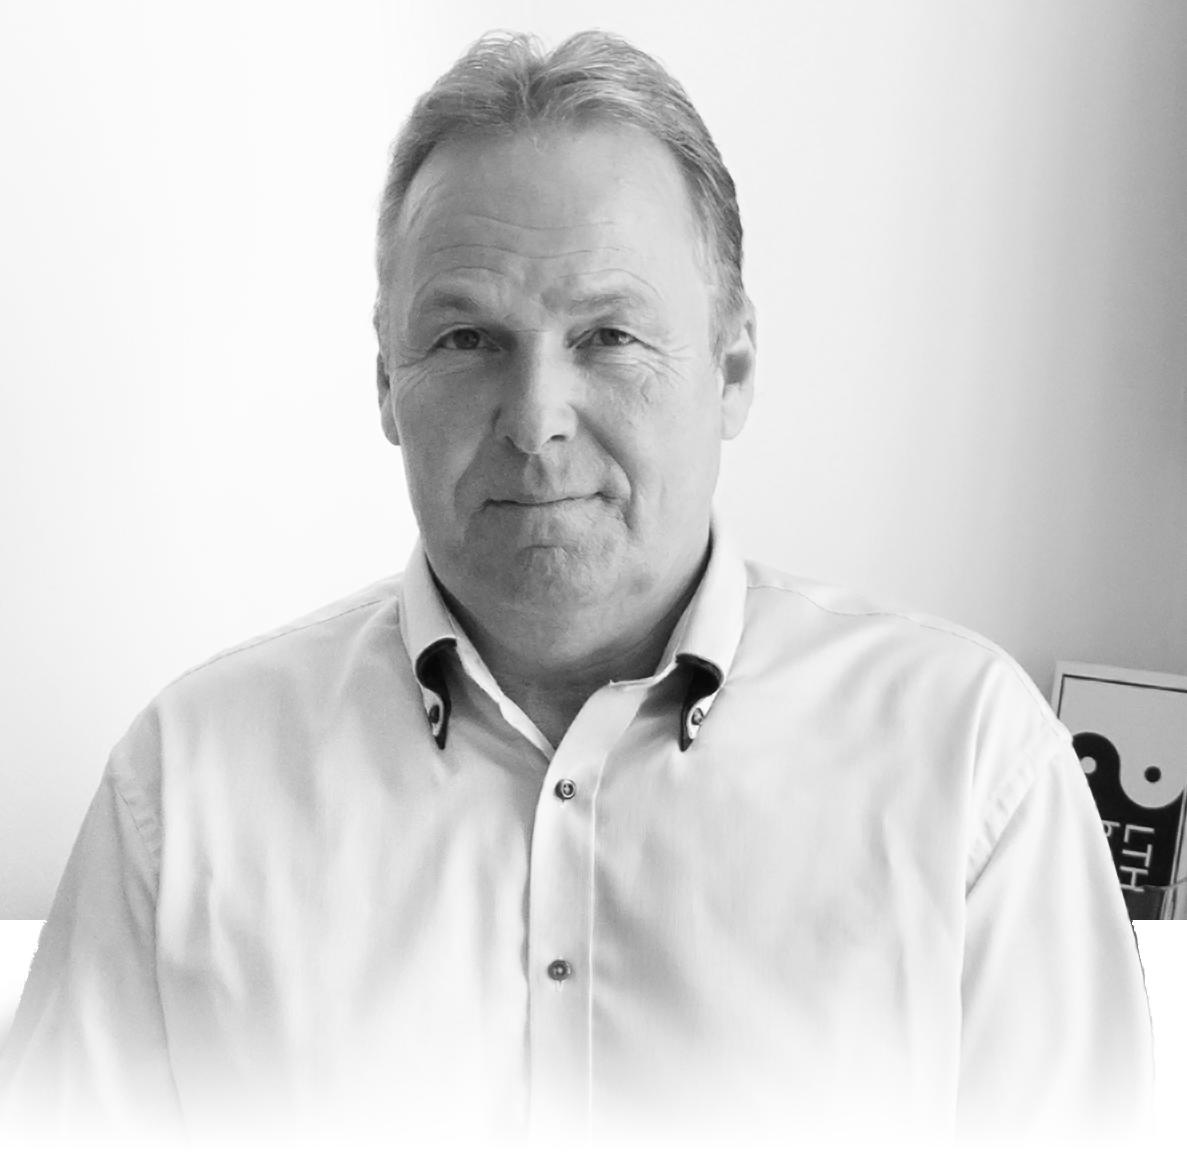 Lars Theilgaard, healer